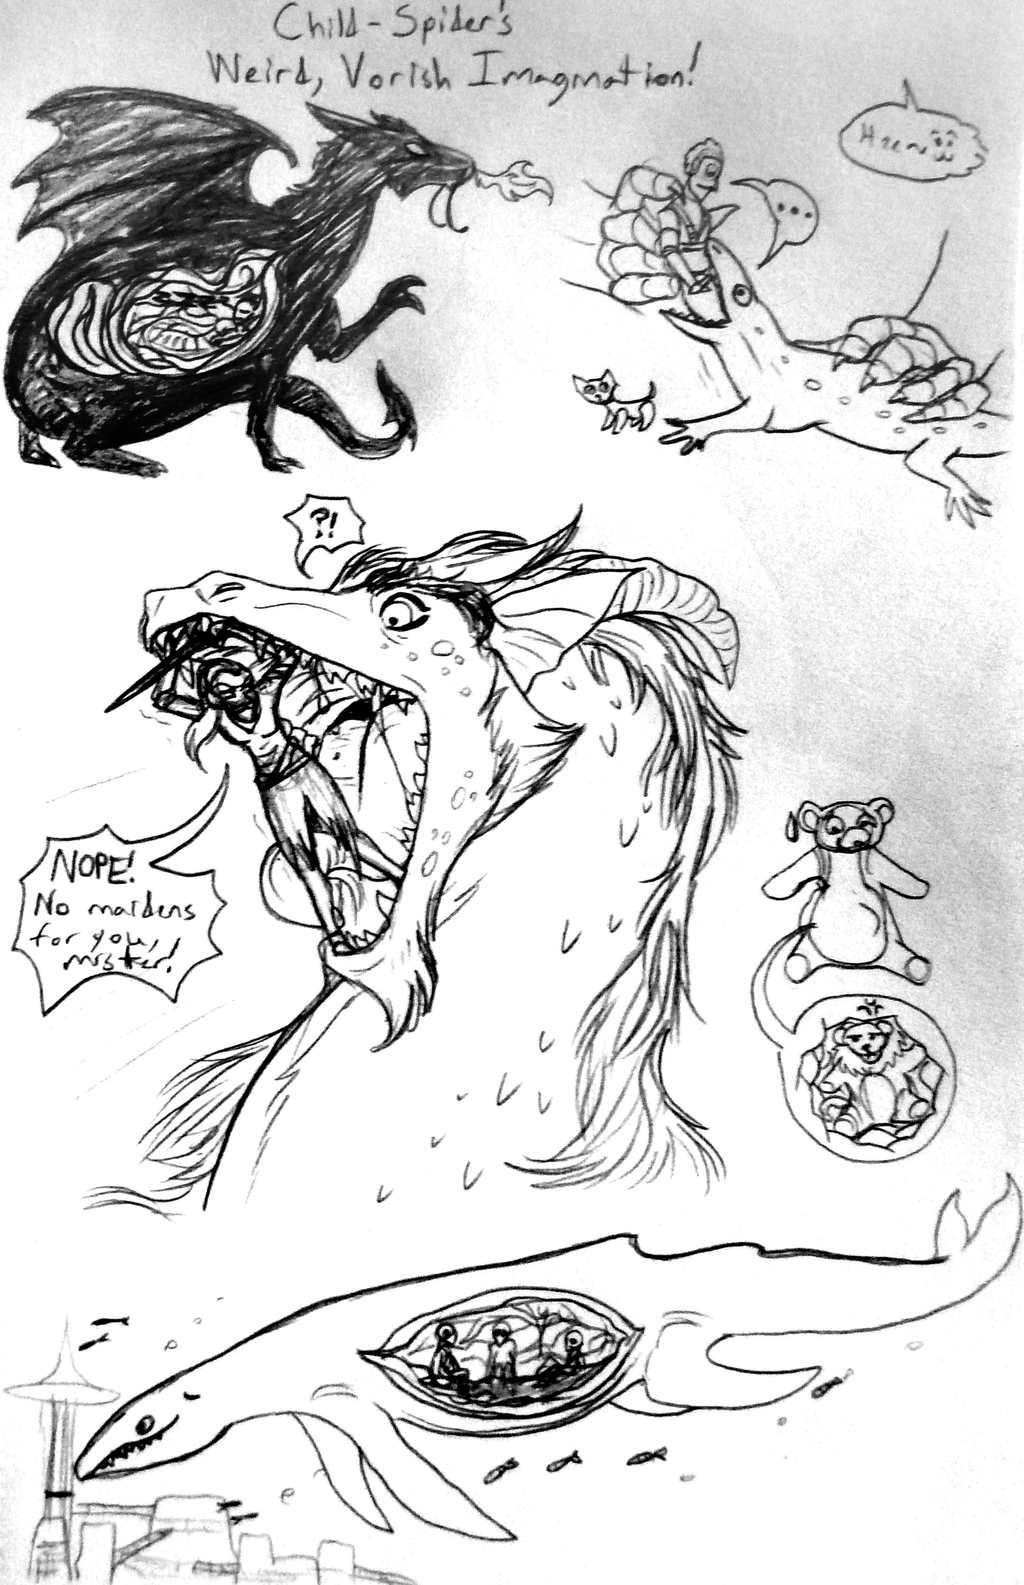 Childhood Vorish Imaginings (Illustrated)